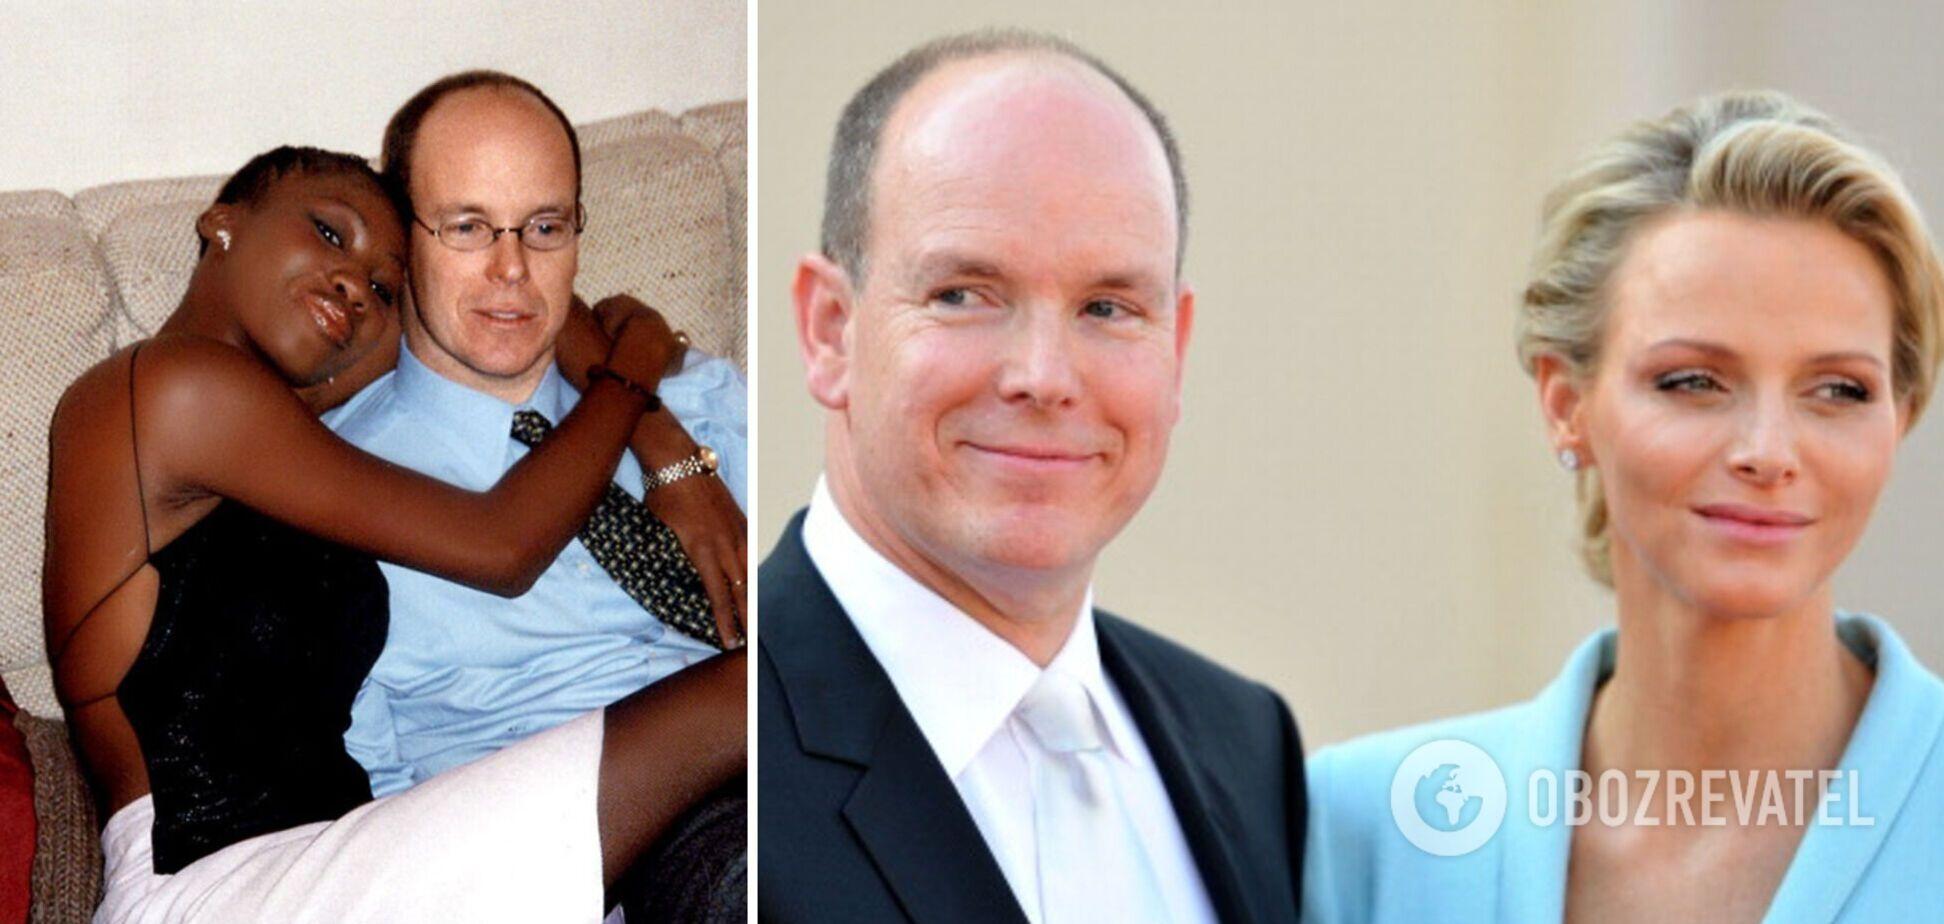 Князь Монако пришел на бал с экс-любовницей, пока его жена лечится в ЮАР